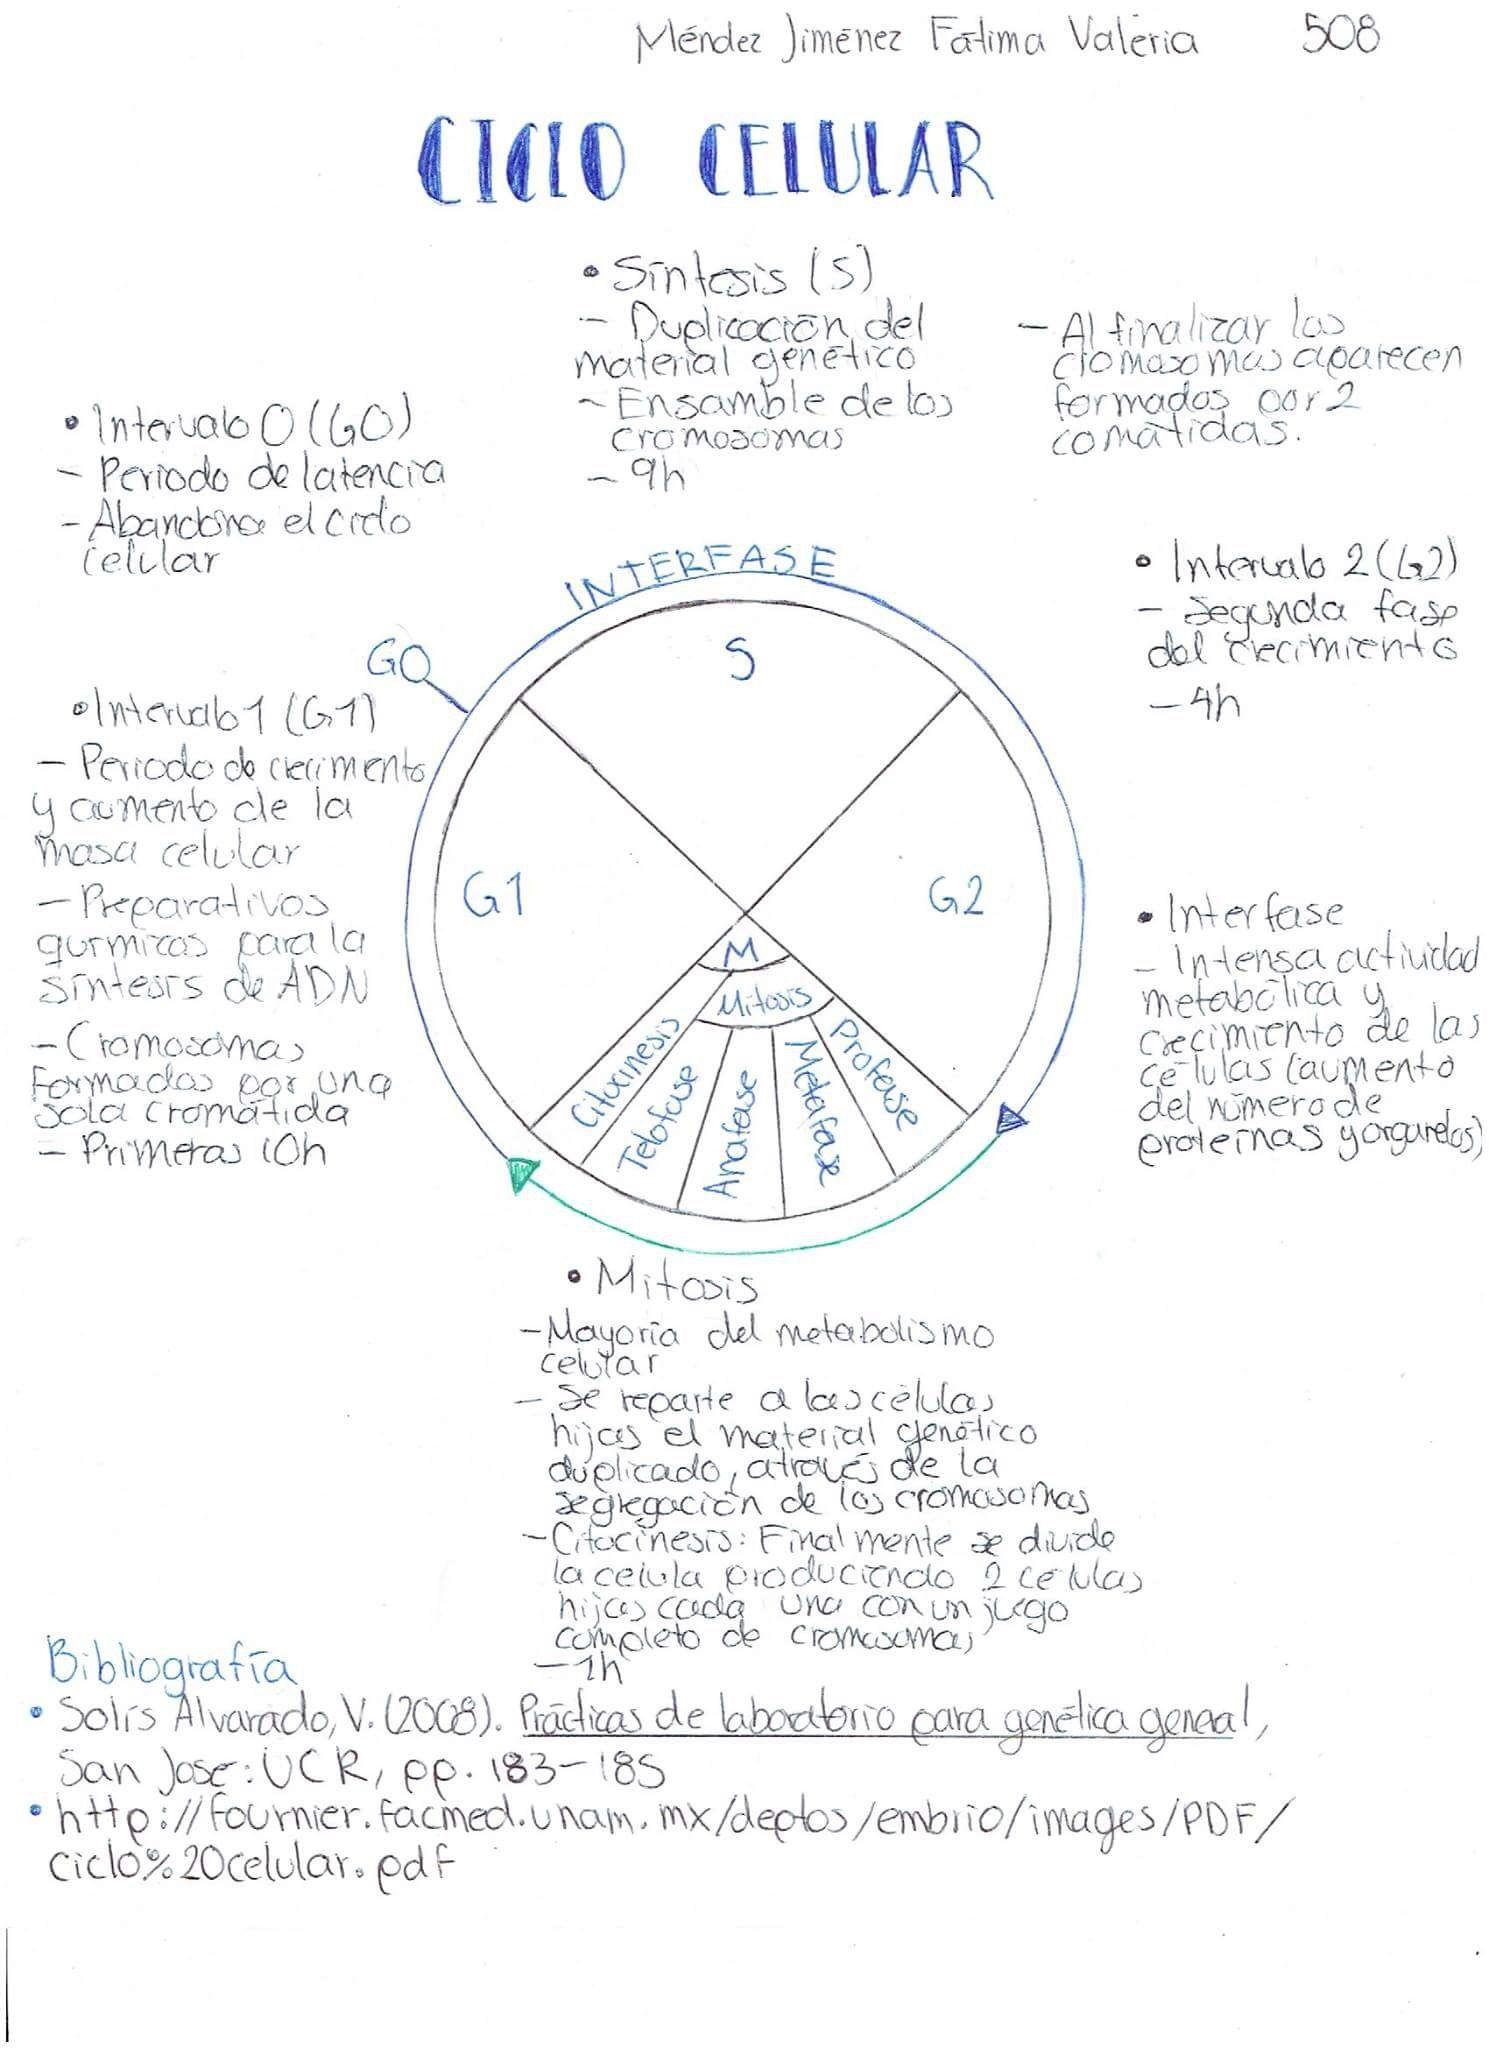 Esquema del ciclo celular fuente httpfournierfacmedunam esquema del ciclo celular fuente httpfournierfacmedunam urtaz Images